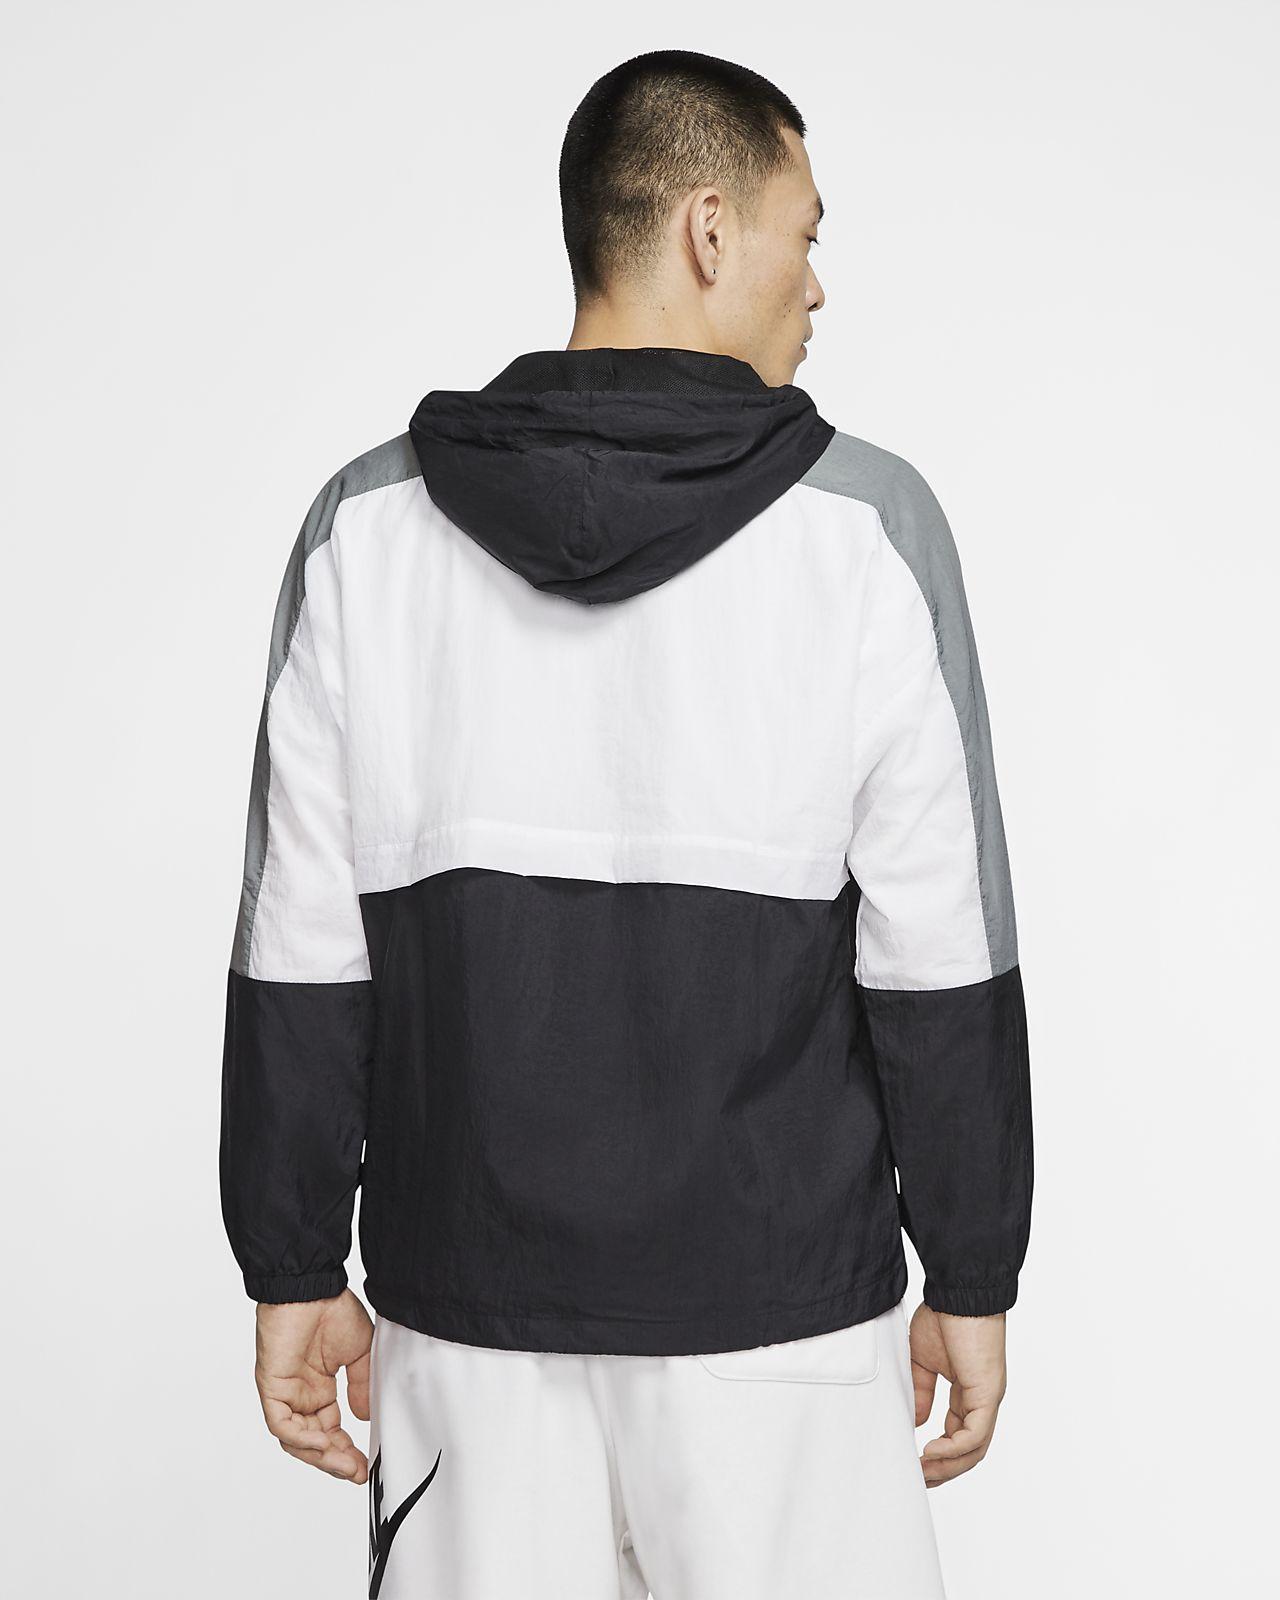 Veste À Capuche Homme Sportswear NIKE | INTERSPORT